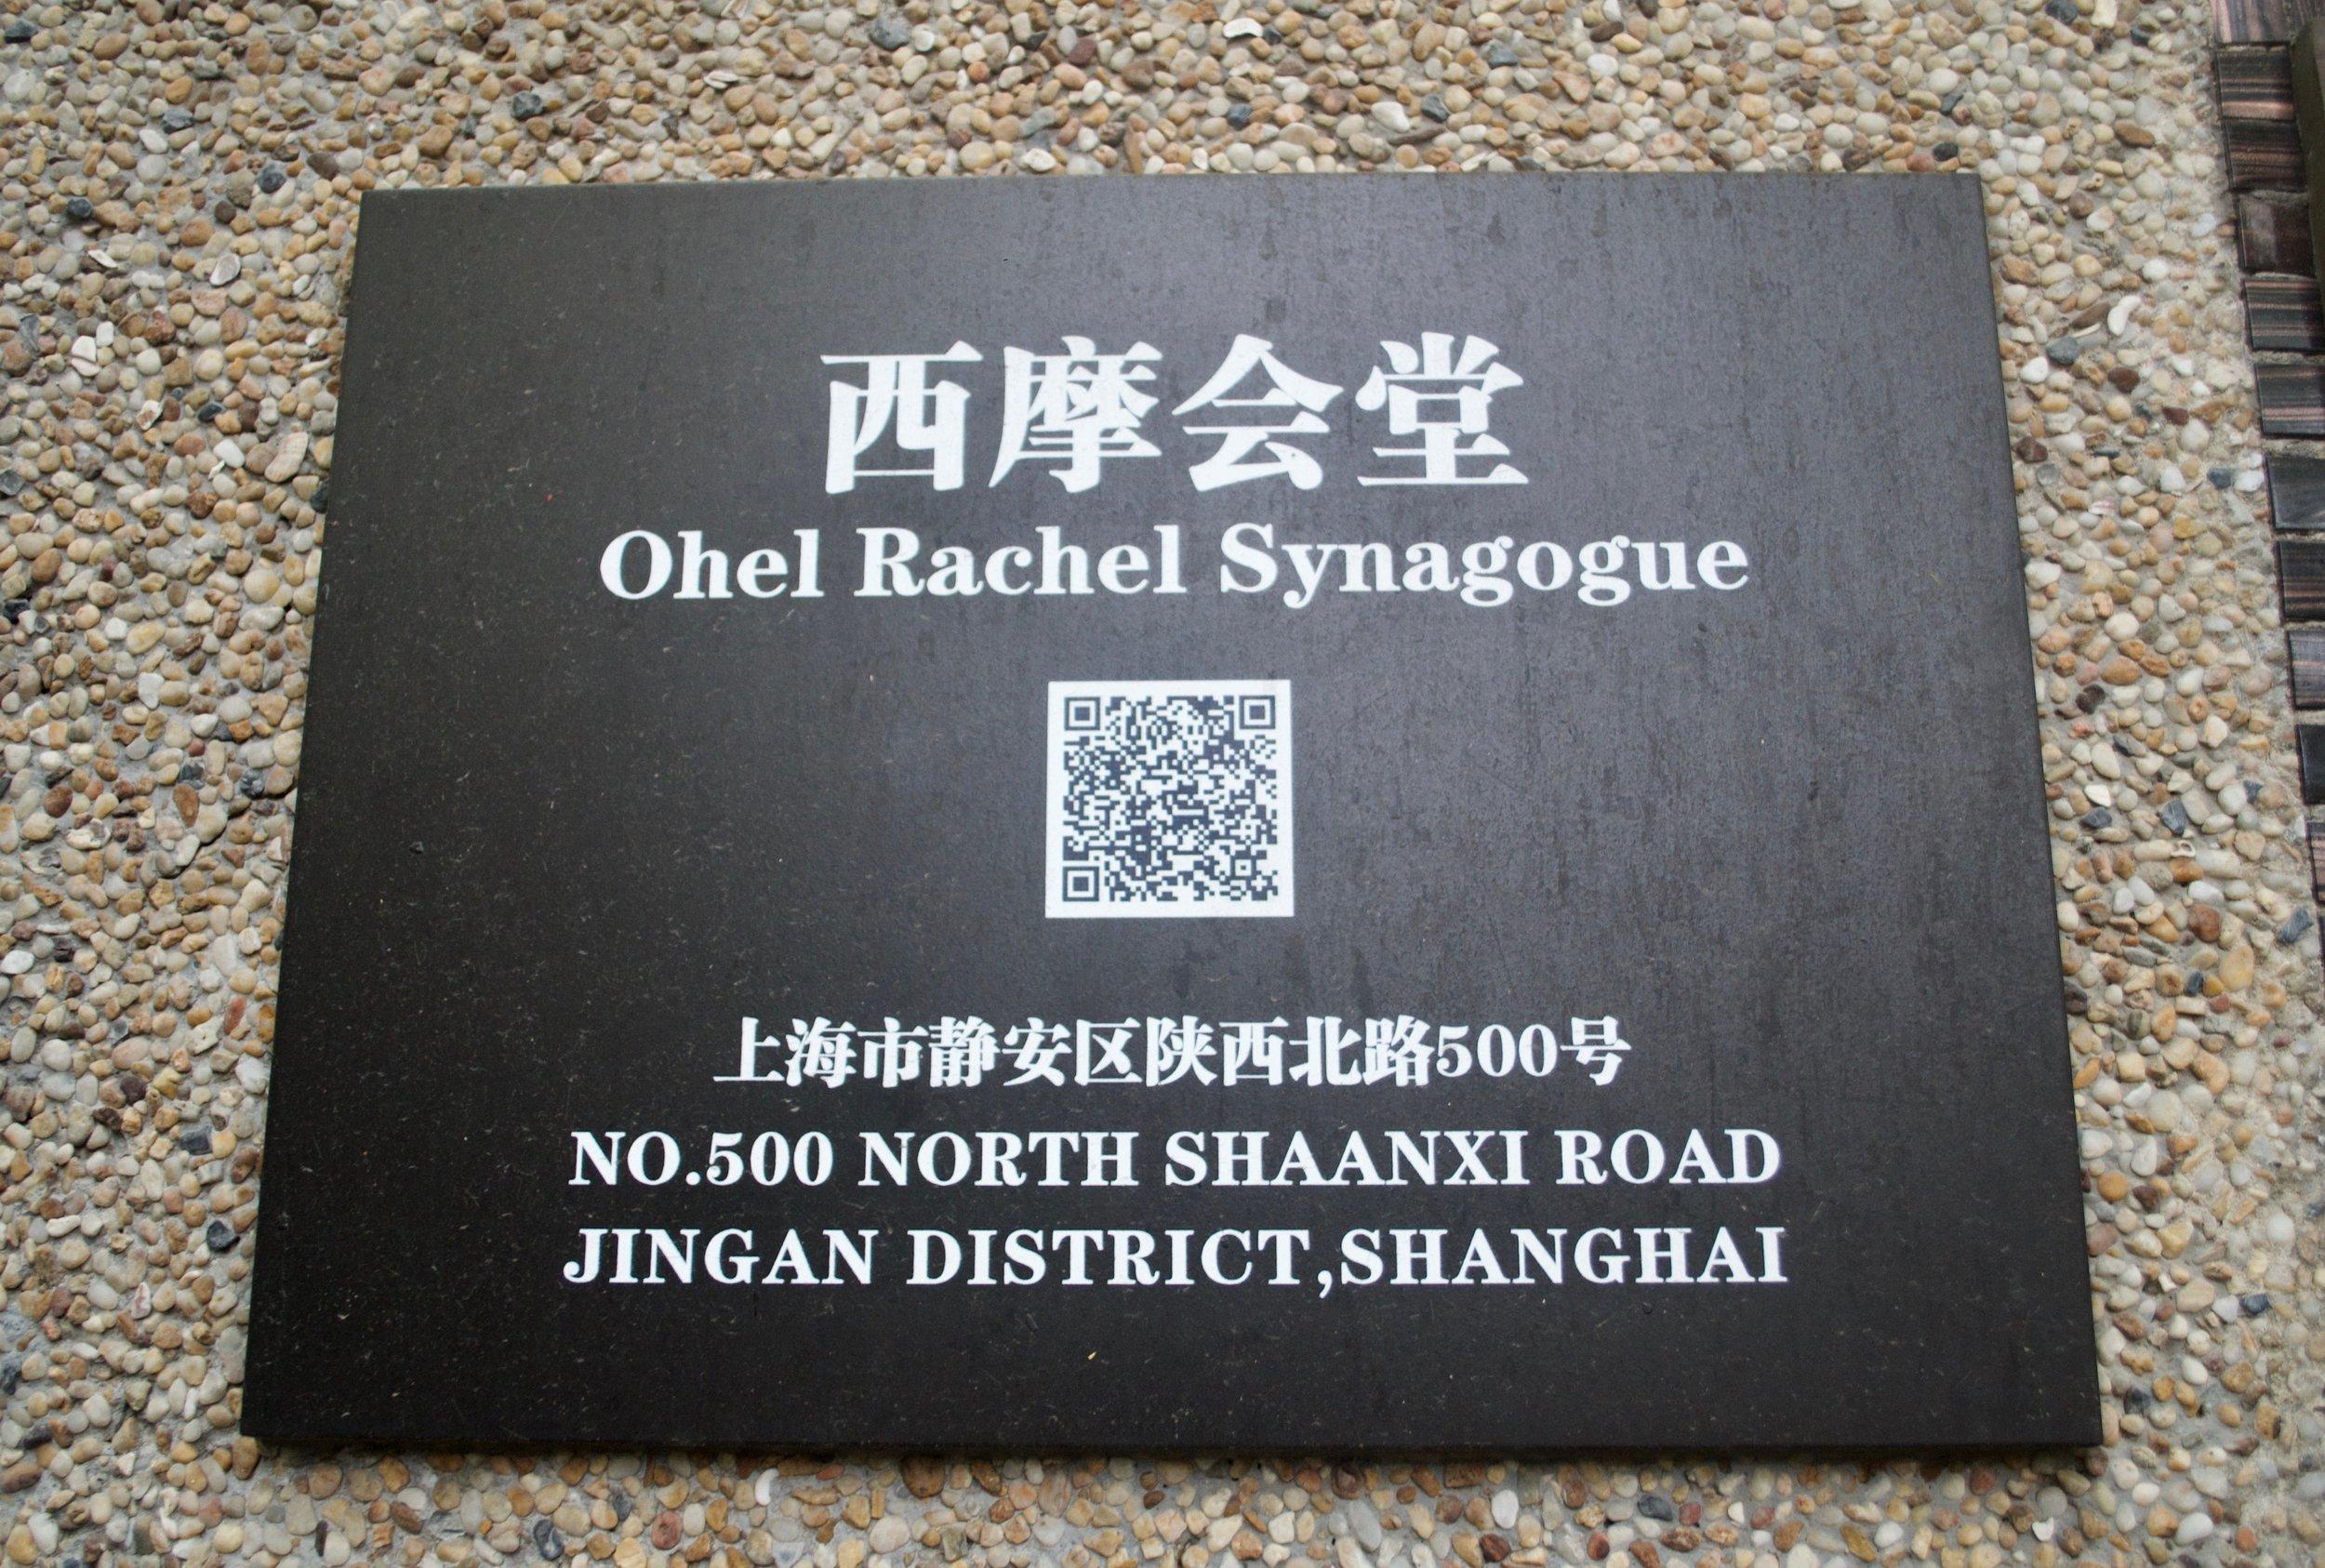 Ohel Rachel [Nicholas Zhang Archives]